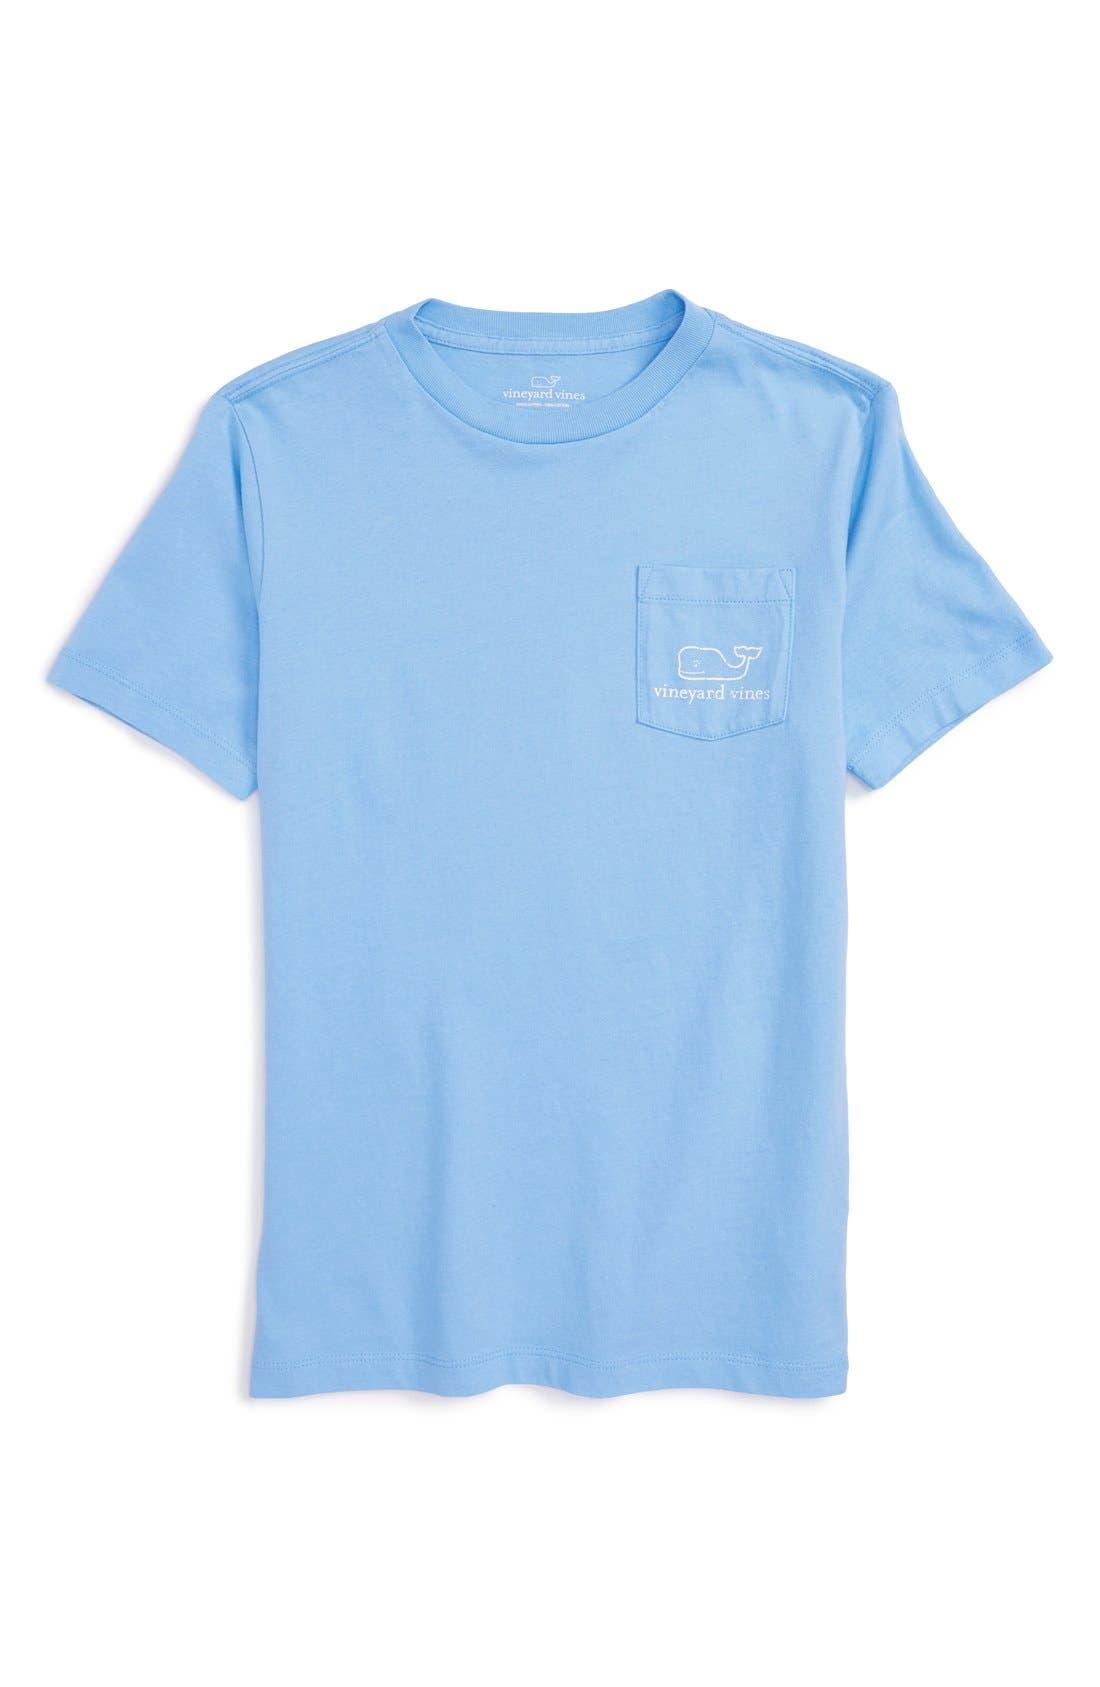 Main Image - vineyard vines Whale T-Shirt (Big Boys)